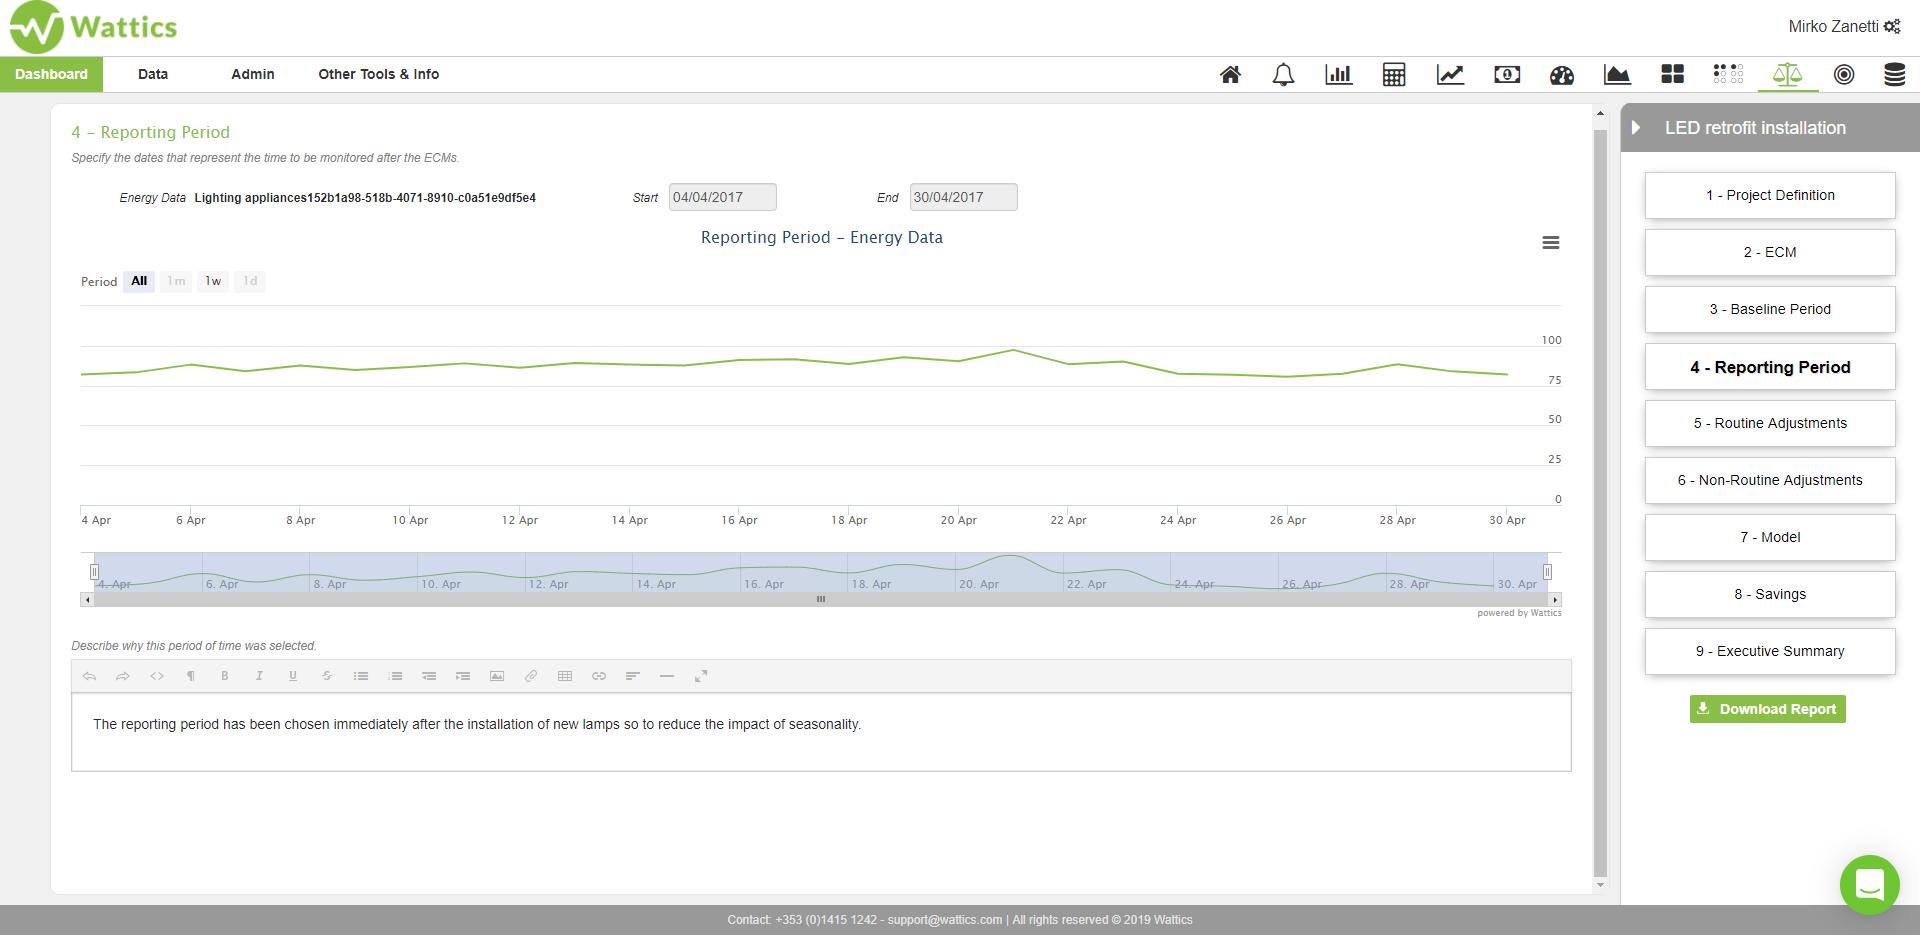 Reporting period graph